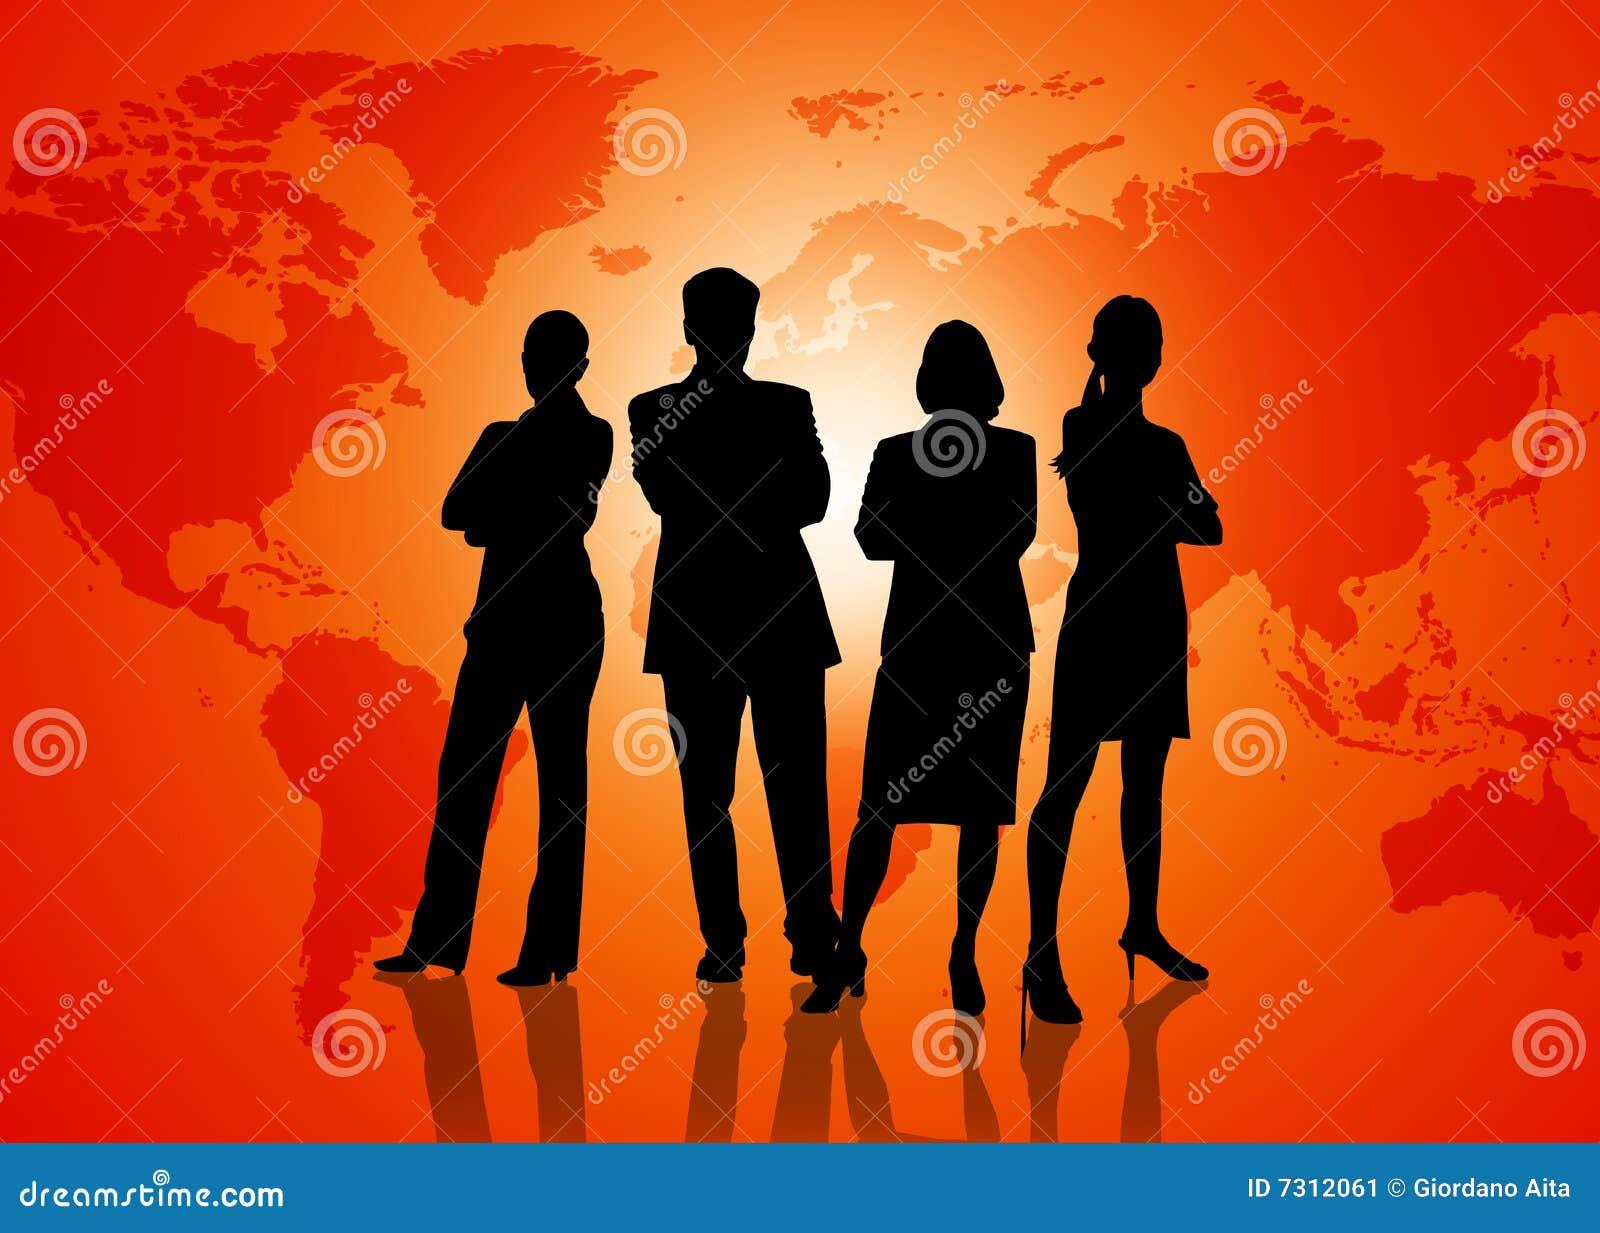 Globalization Business Stock Image - Image: 7312061